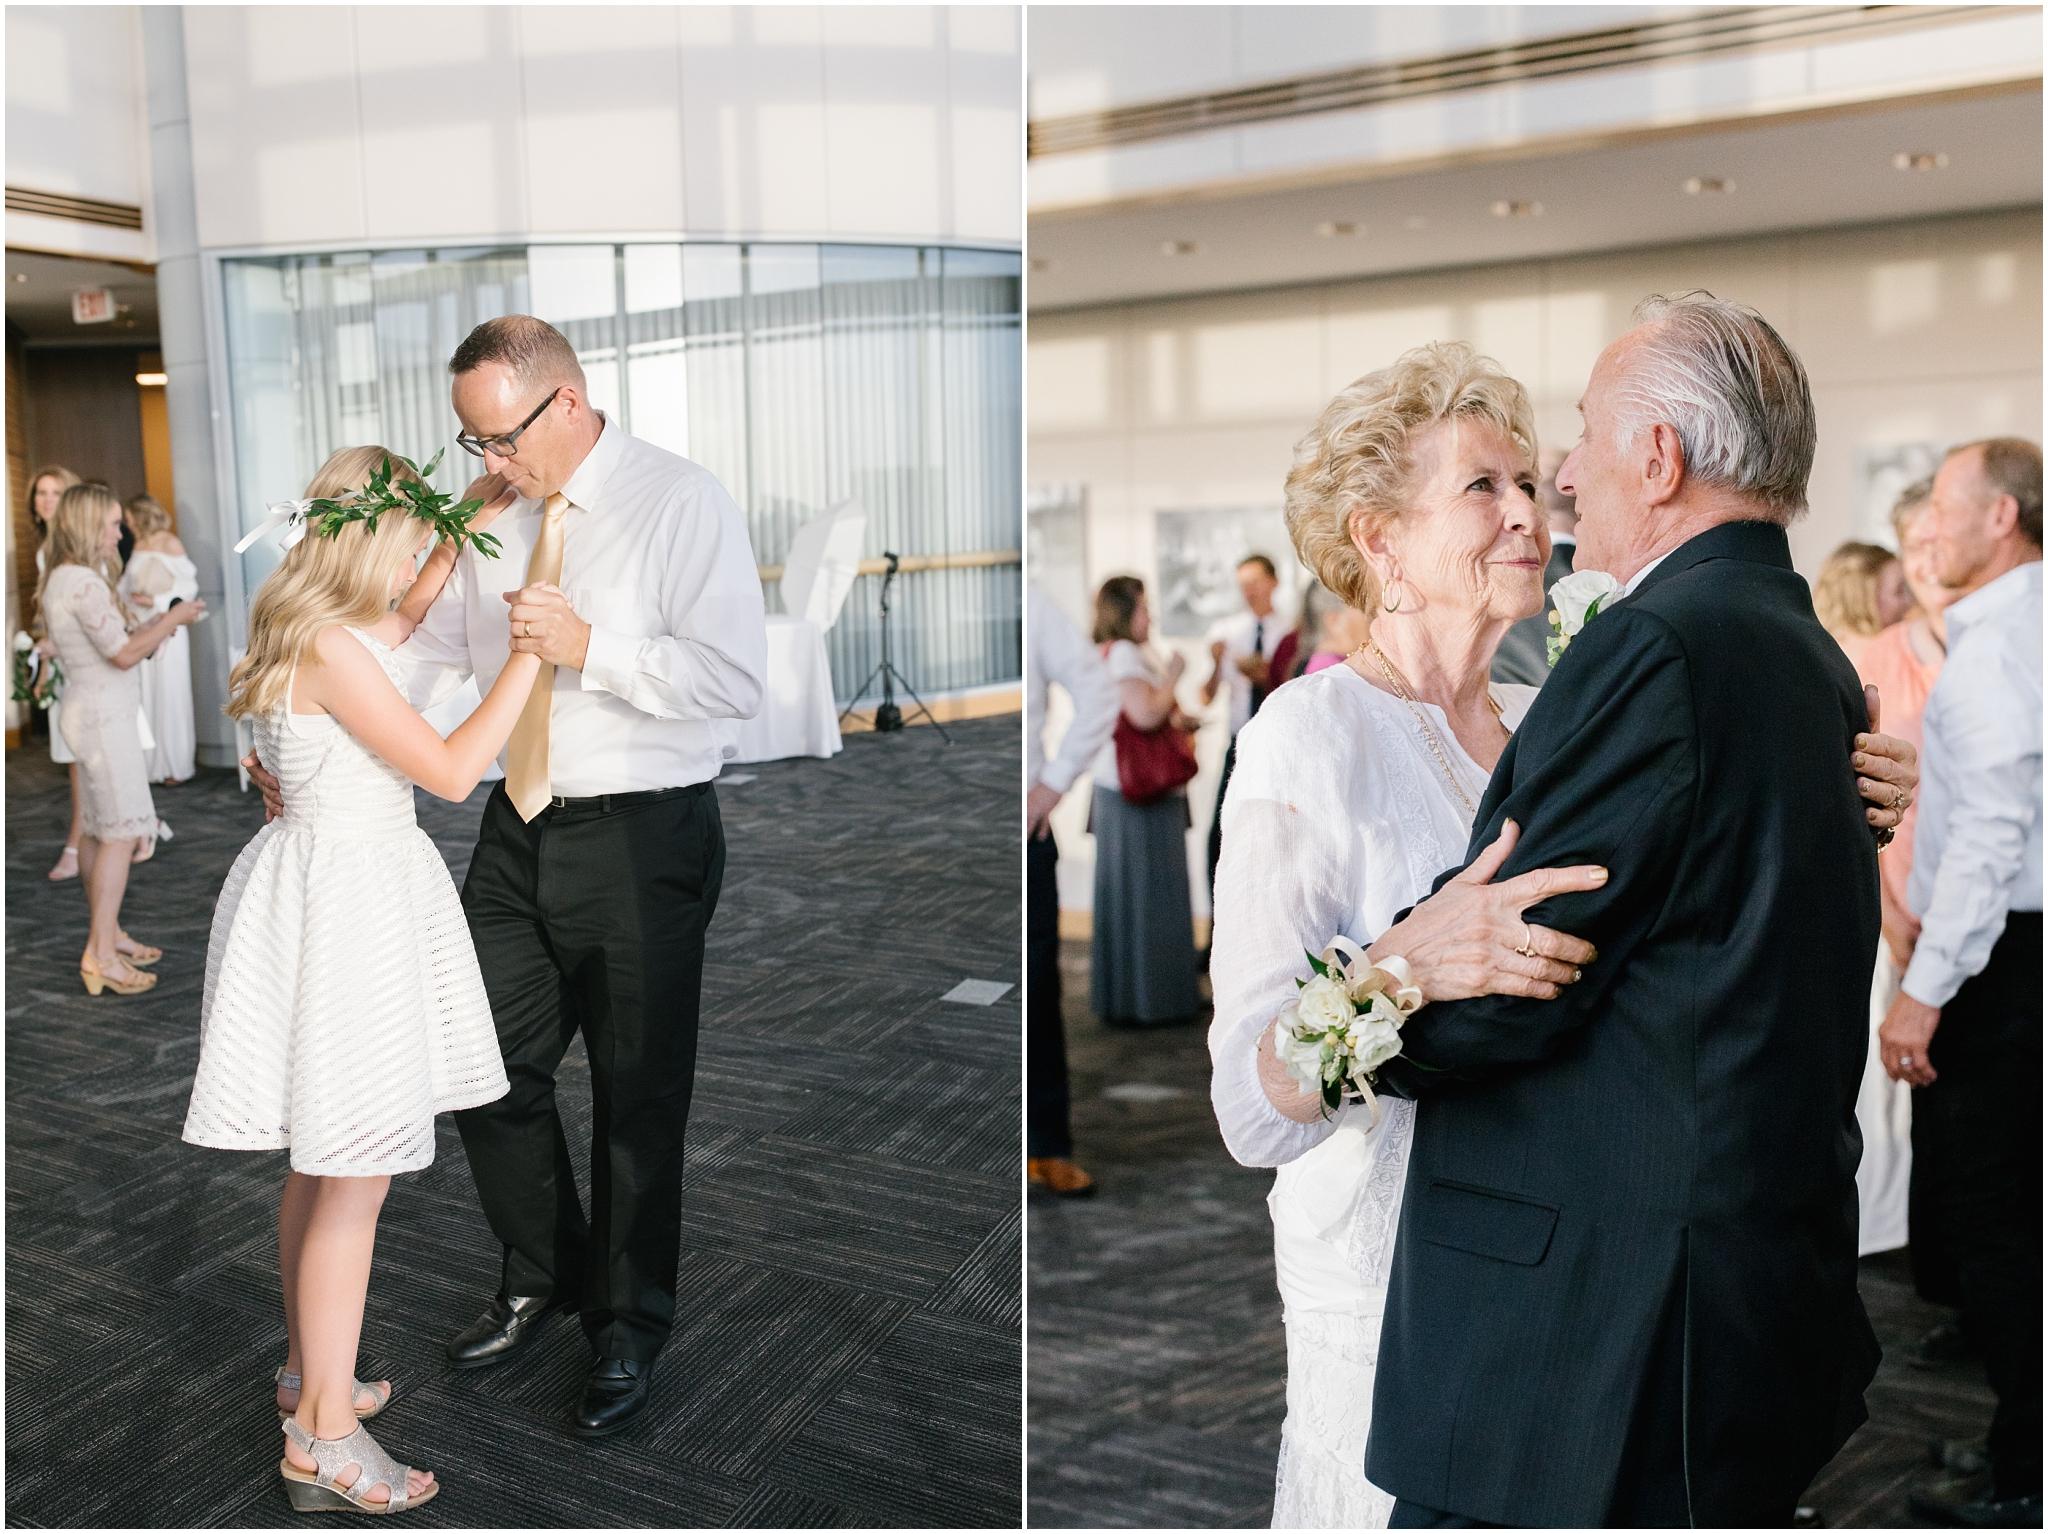 CherylandTyler-602_Lizzie-B-Imagery-Utah-Wedding-Photographer-Salt-Lake-City-Temple-Wells-Fargo-Building-Reception.jpg